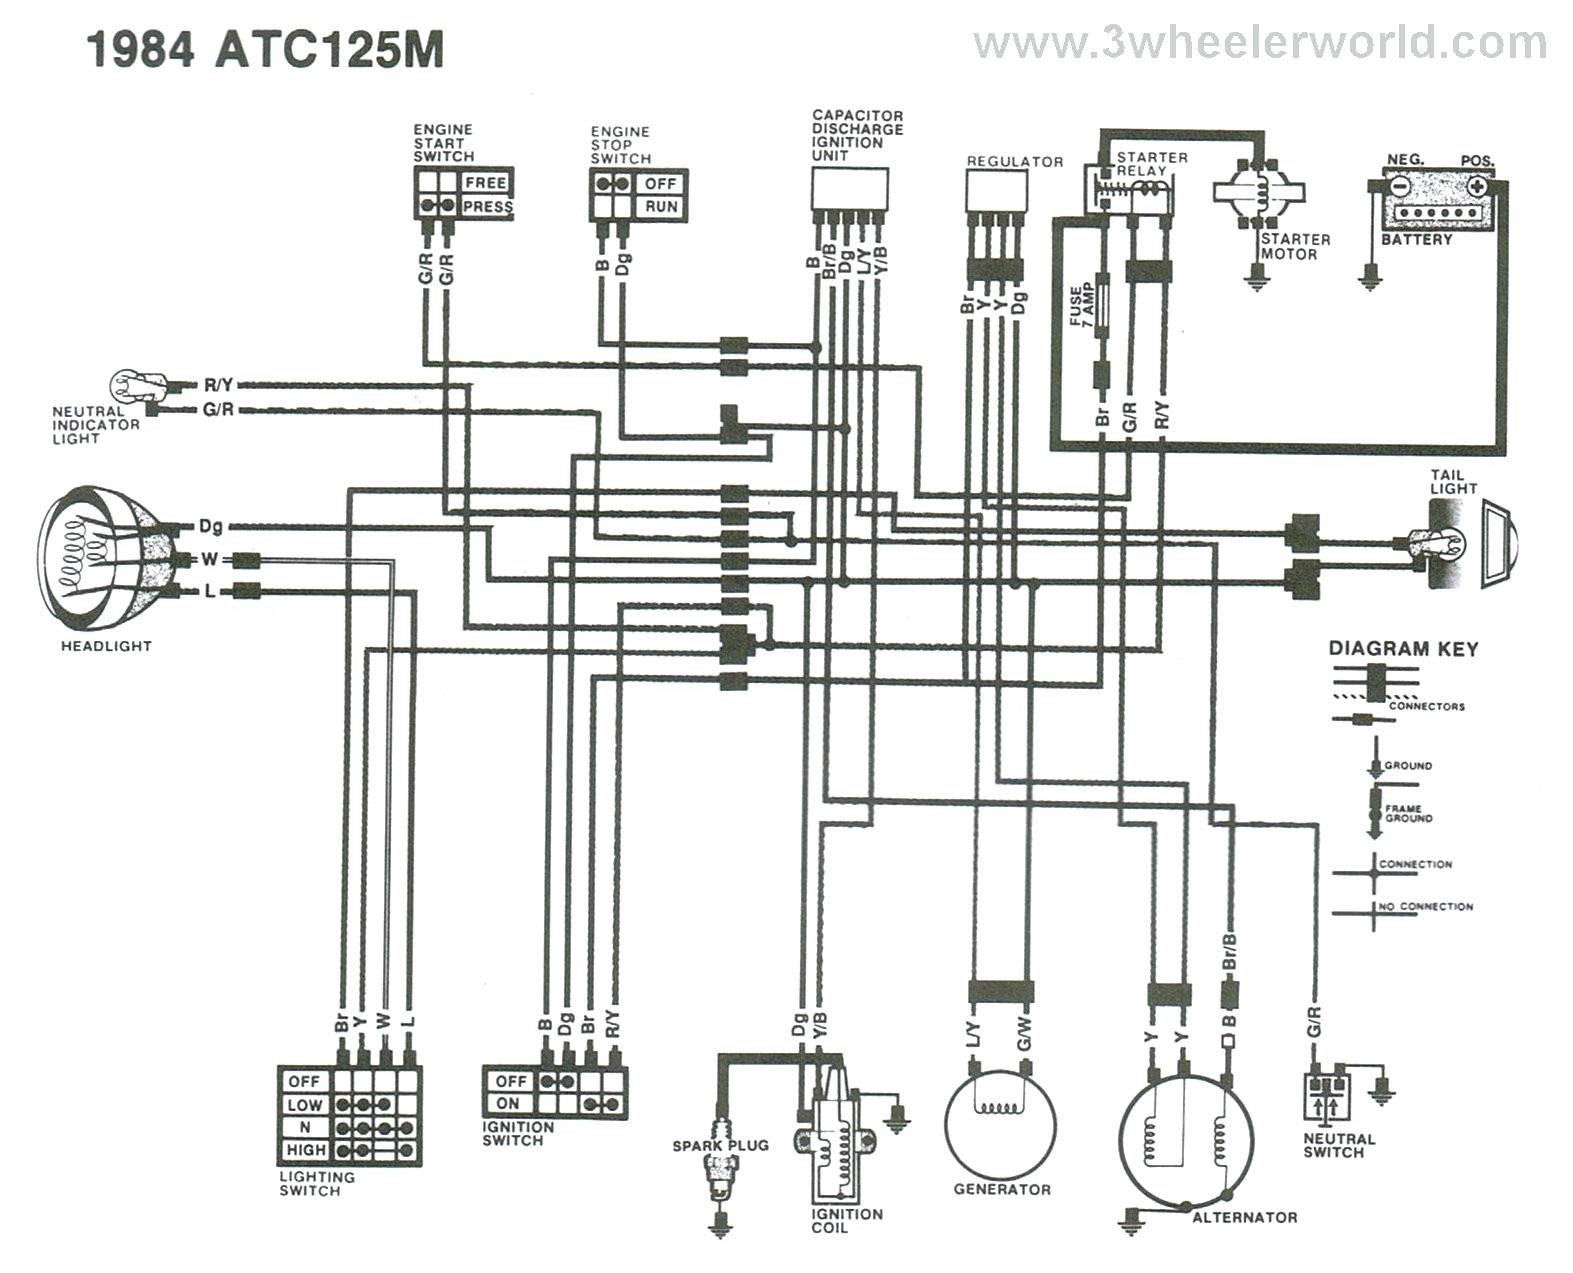 Honda Xrm 125 Engine Diagram Motorcycle Wiring Schematics Motor Orig Diagrams O Of